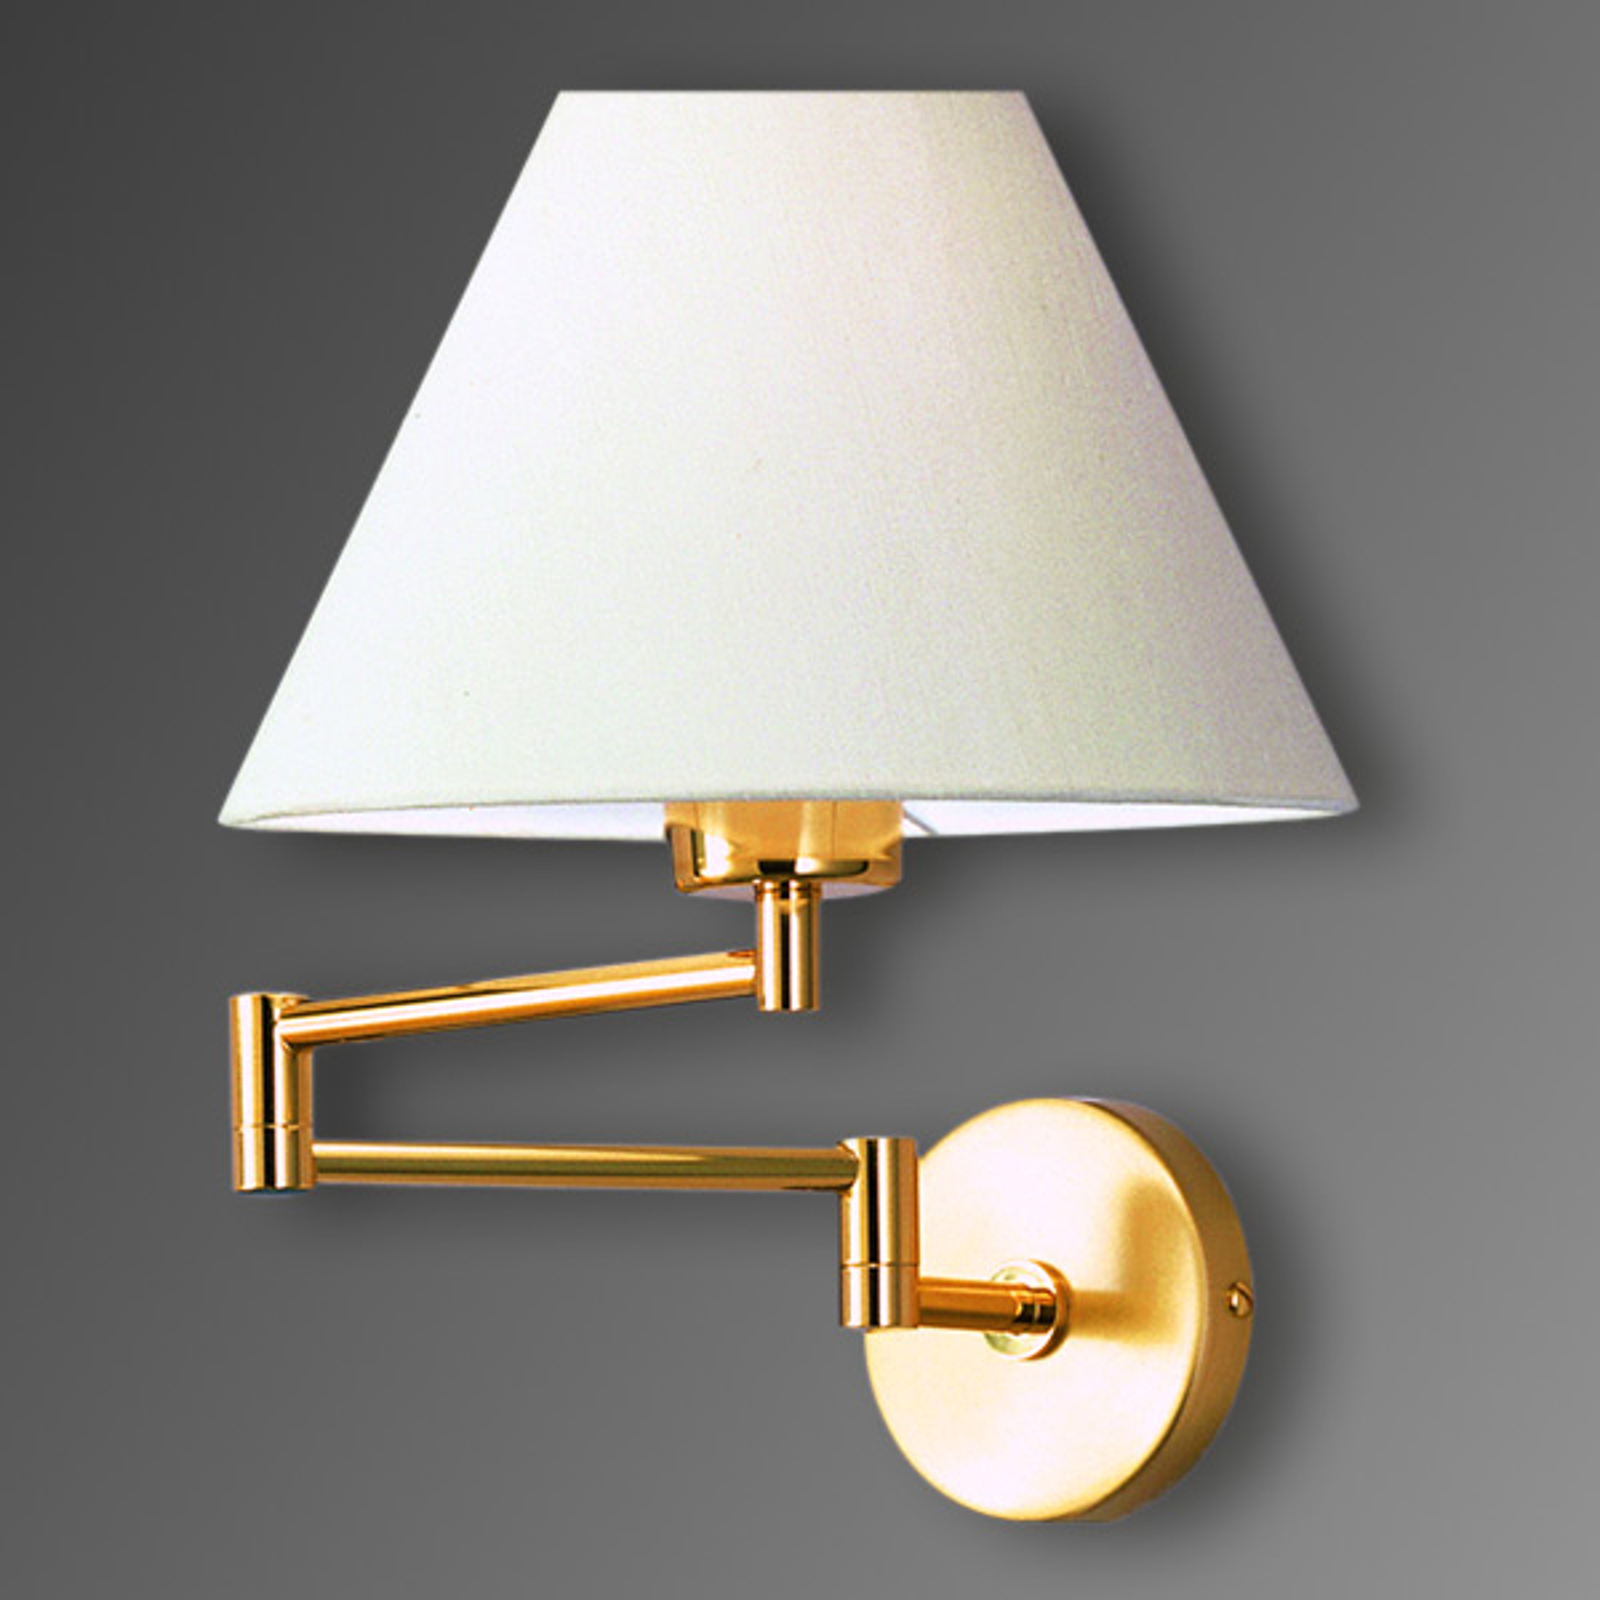 Knapstein lampor | Lampkultur.se